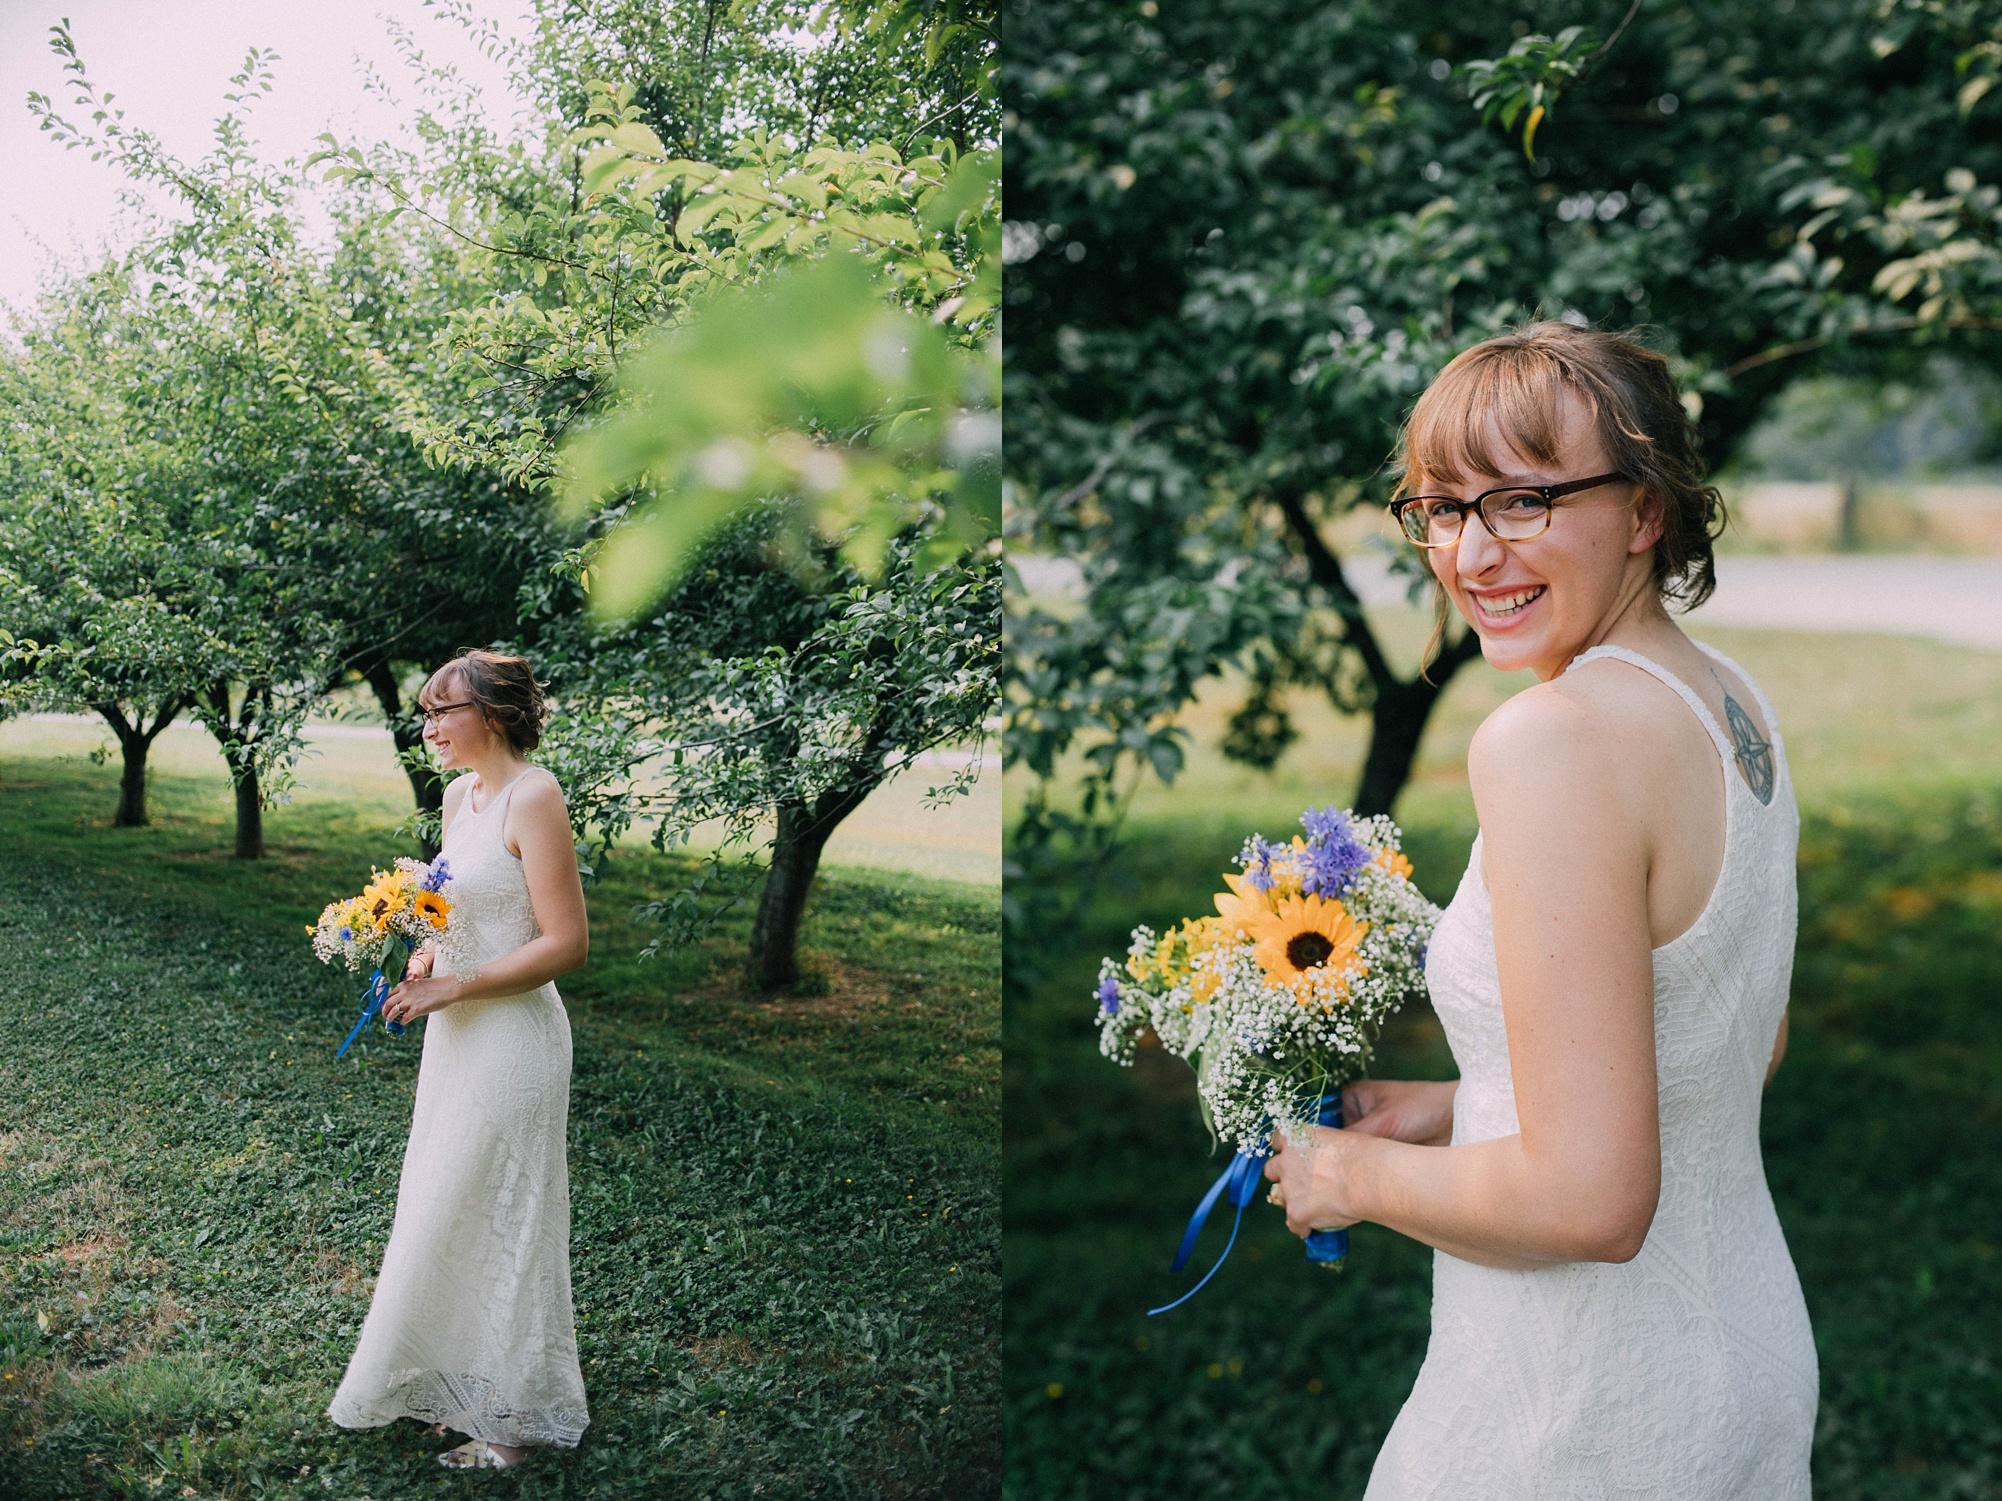 ashley_vos_seattle_ wedding_photographer_0457.jpg